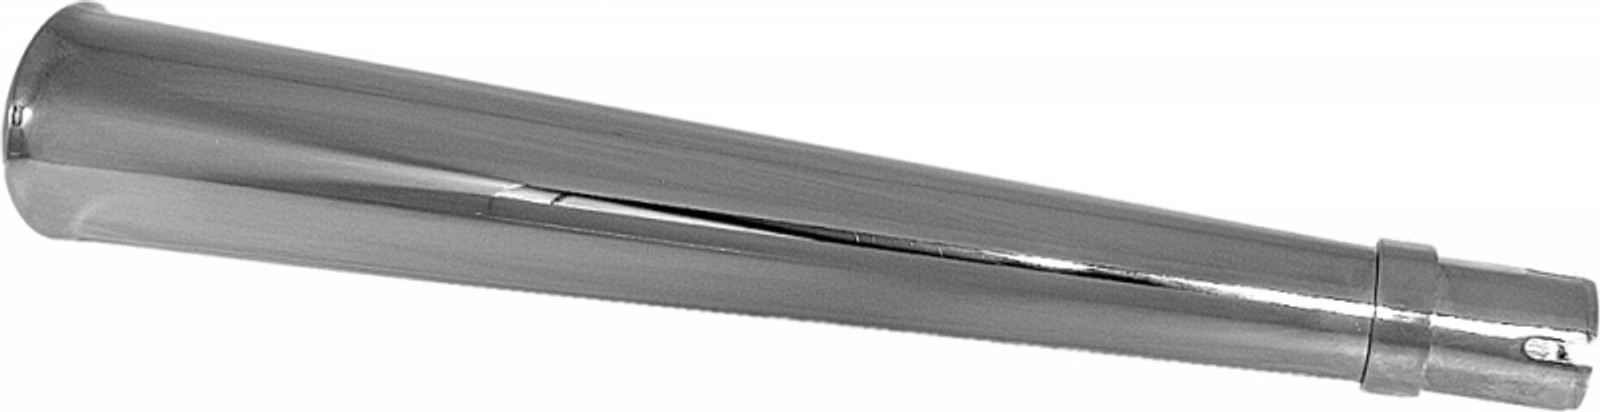 "Chrome 24/"" Universal Widemouth Megaphone Style Muffler 80-84013"